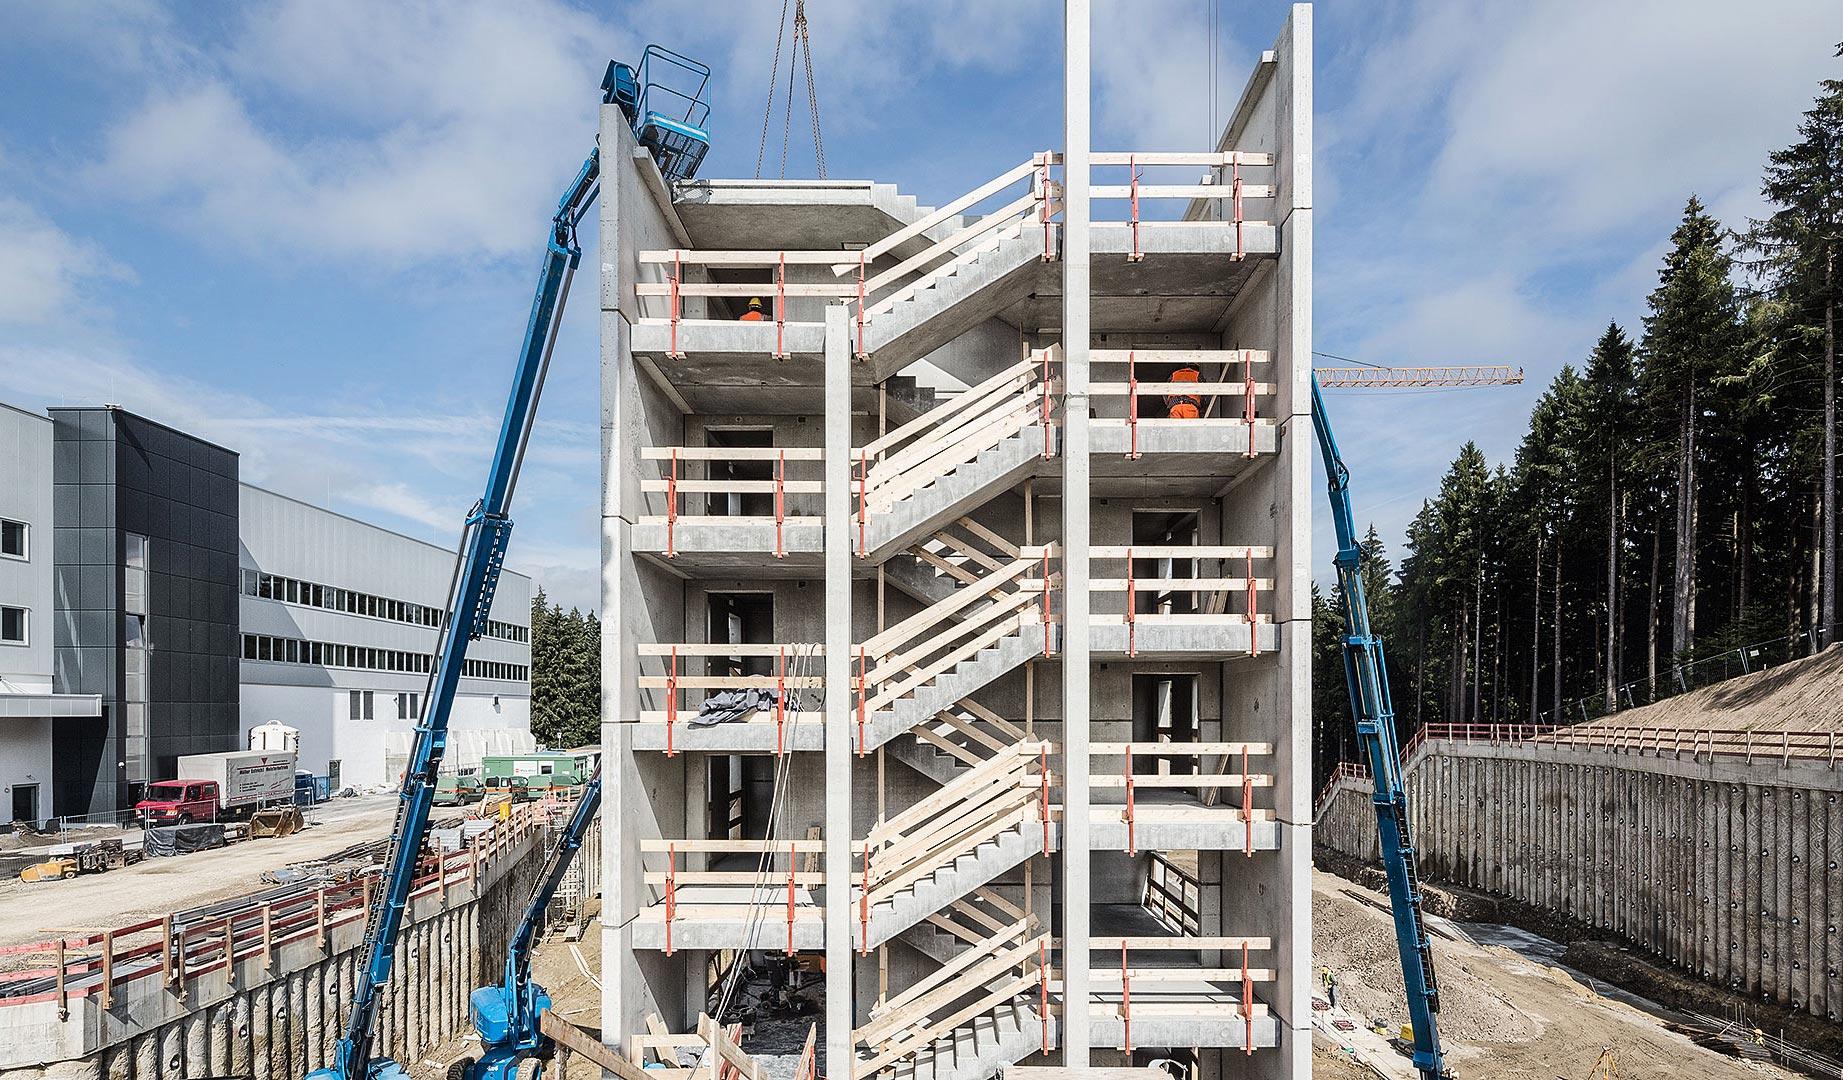 Modularer Aufbau eines Treppenhaus-Turms